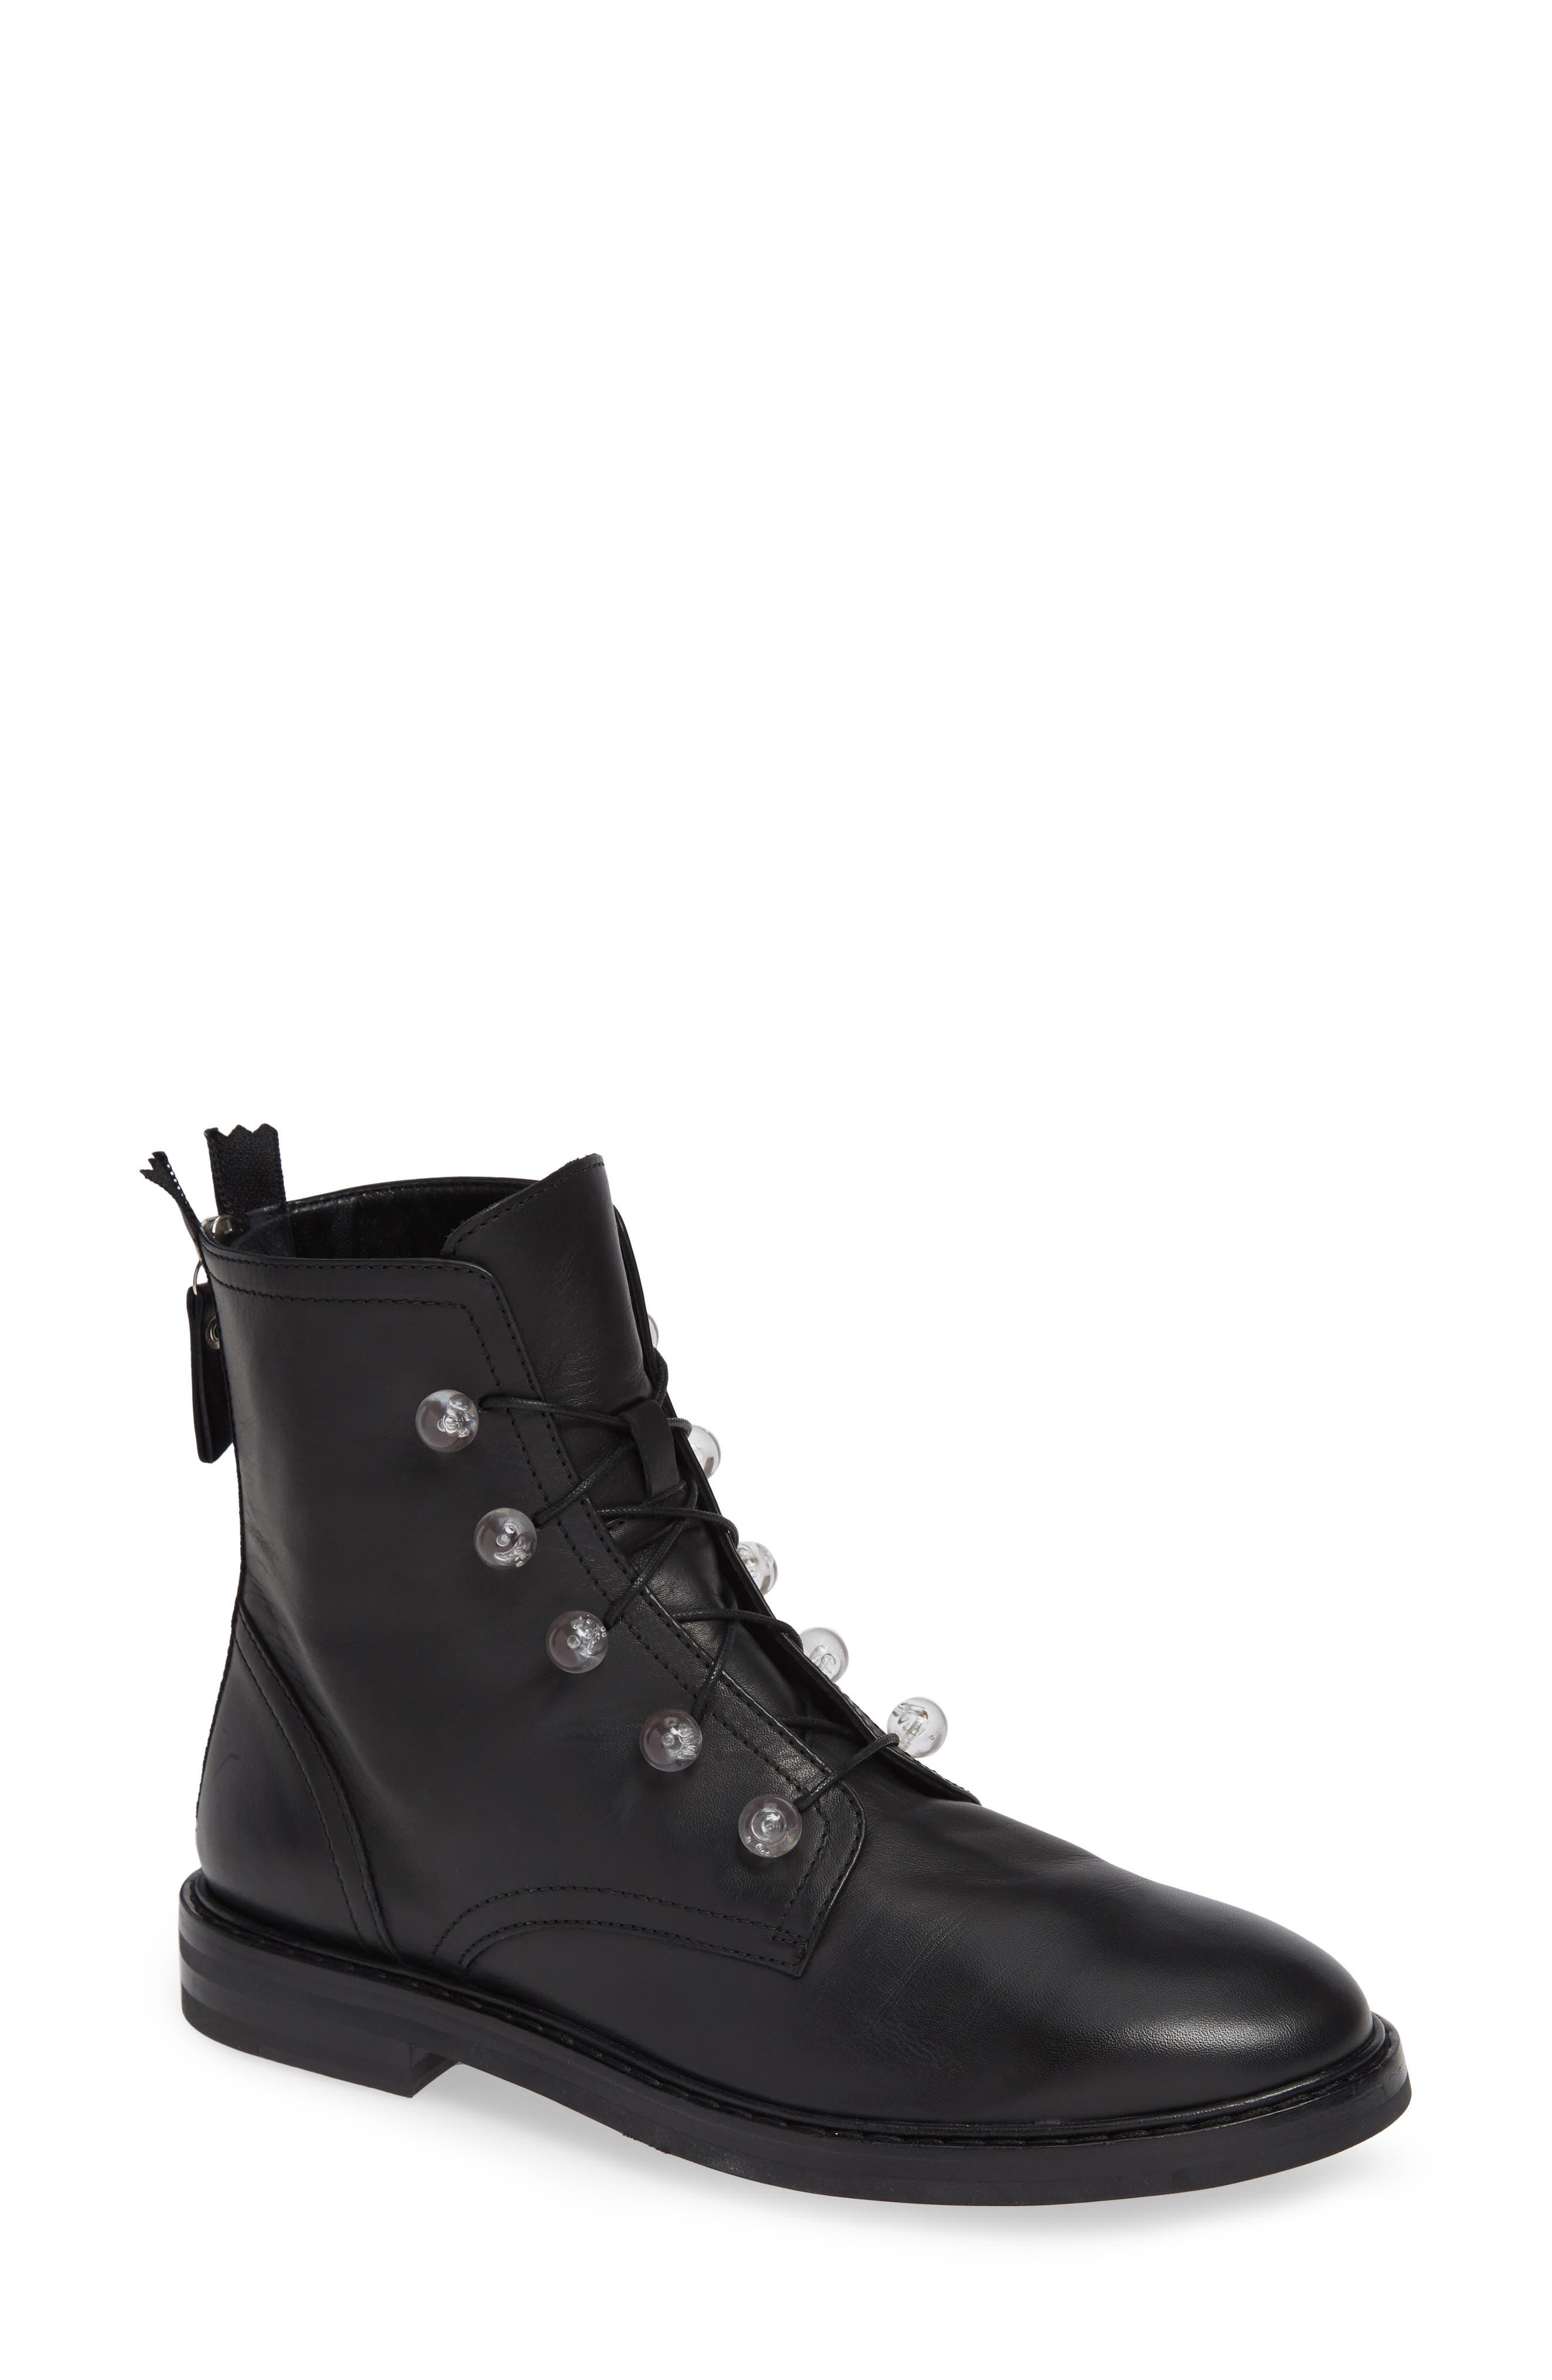 AGL ATTILIO GIUSTI LEOMBRUNI Lucite Knob Combat Boot in Black Leather